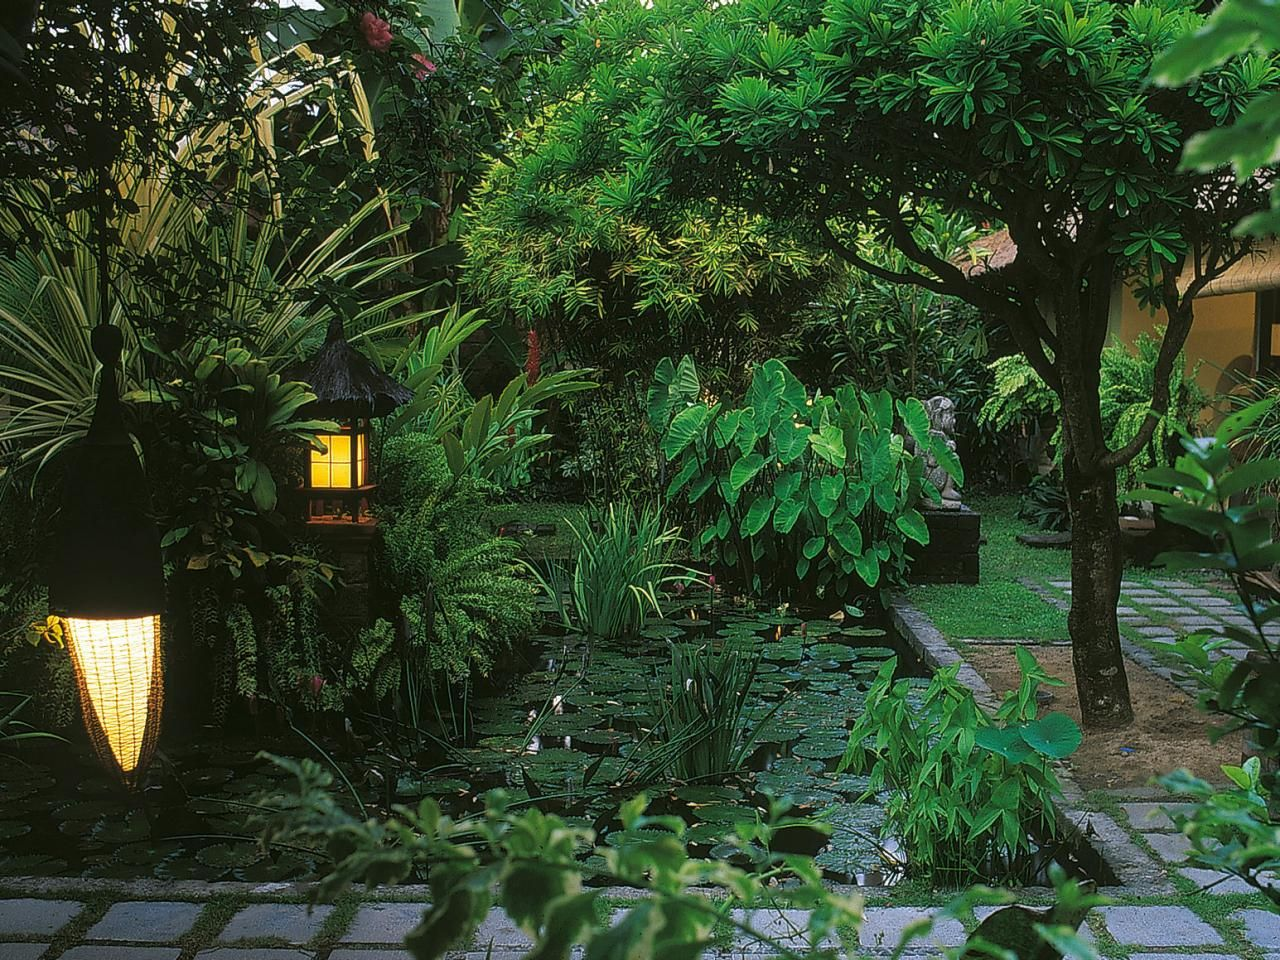 22 Shady And Fresh Gardens To Urban Jungle Ideas House Design And Decor Tropical Landscape Design Tropical Landscaping Tropical Garden Design